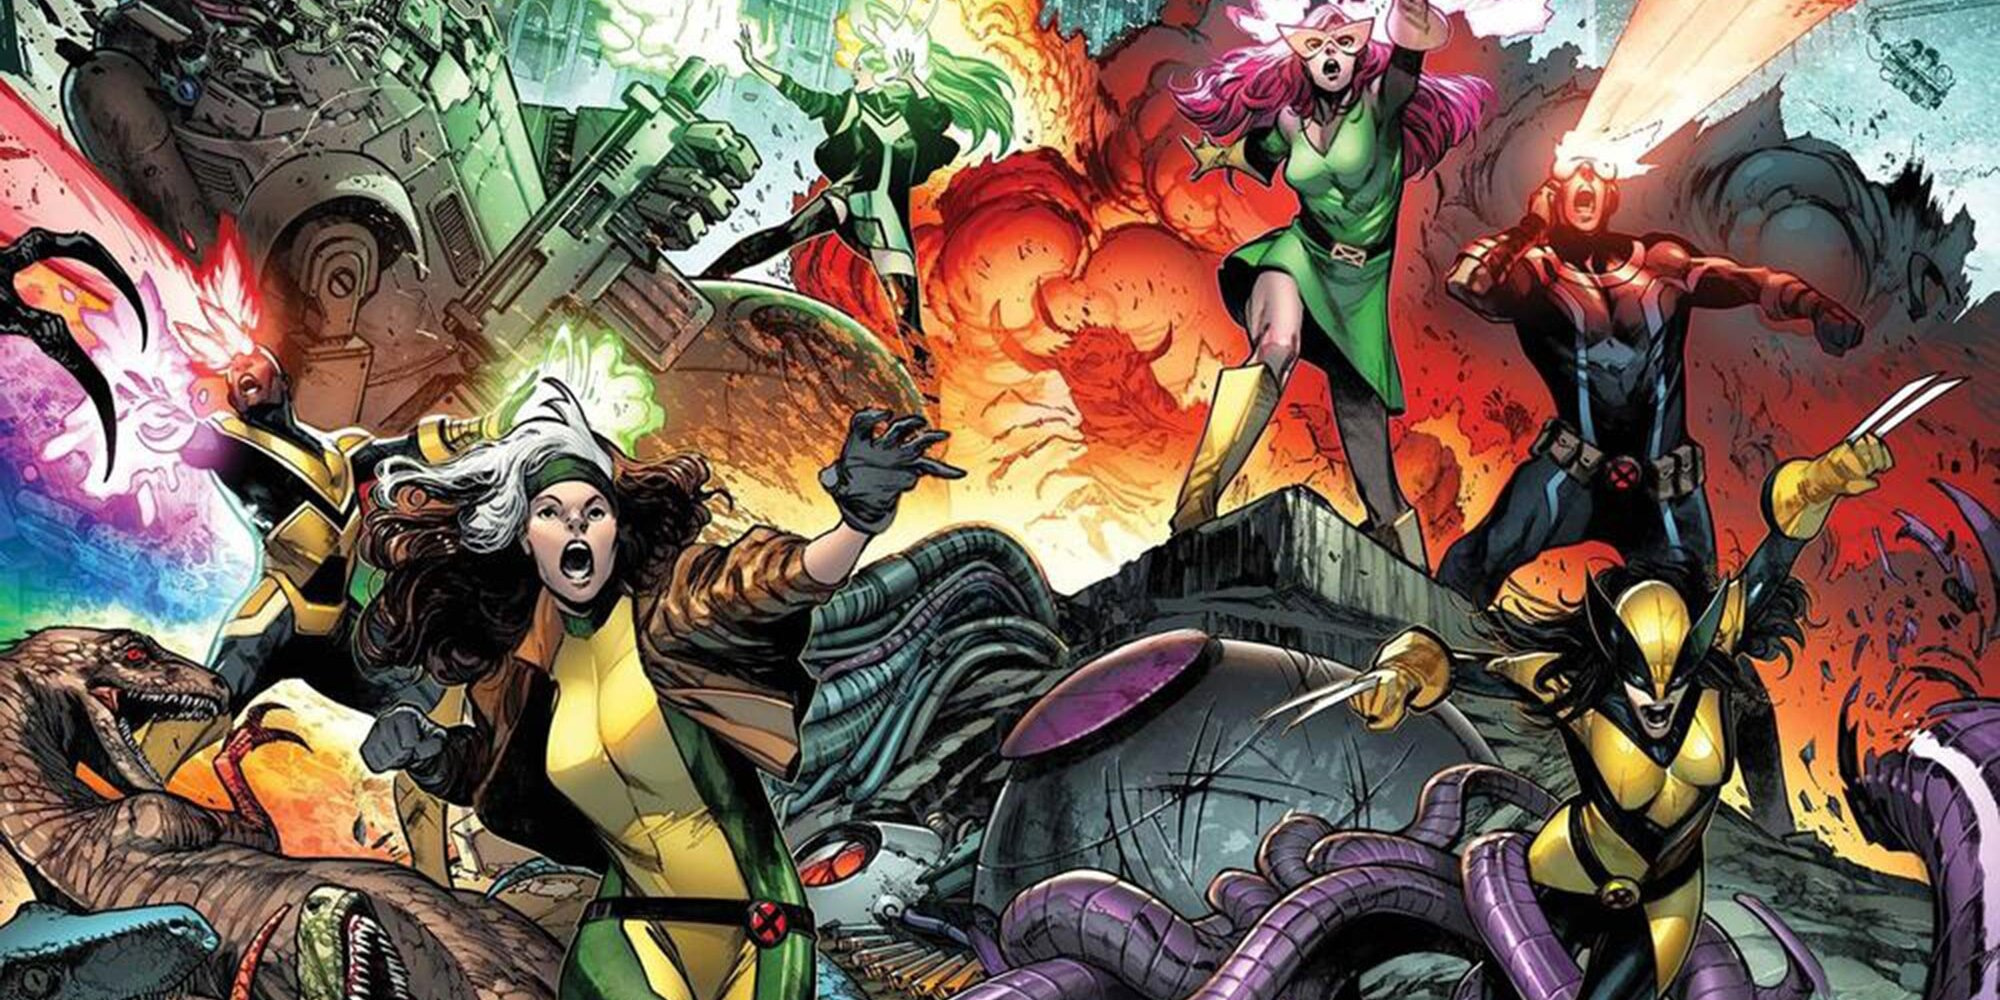 Marvel unveils the full, surprising lineup of new X-Men team